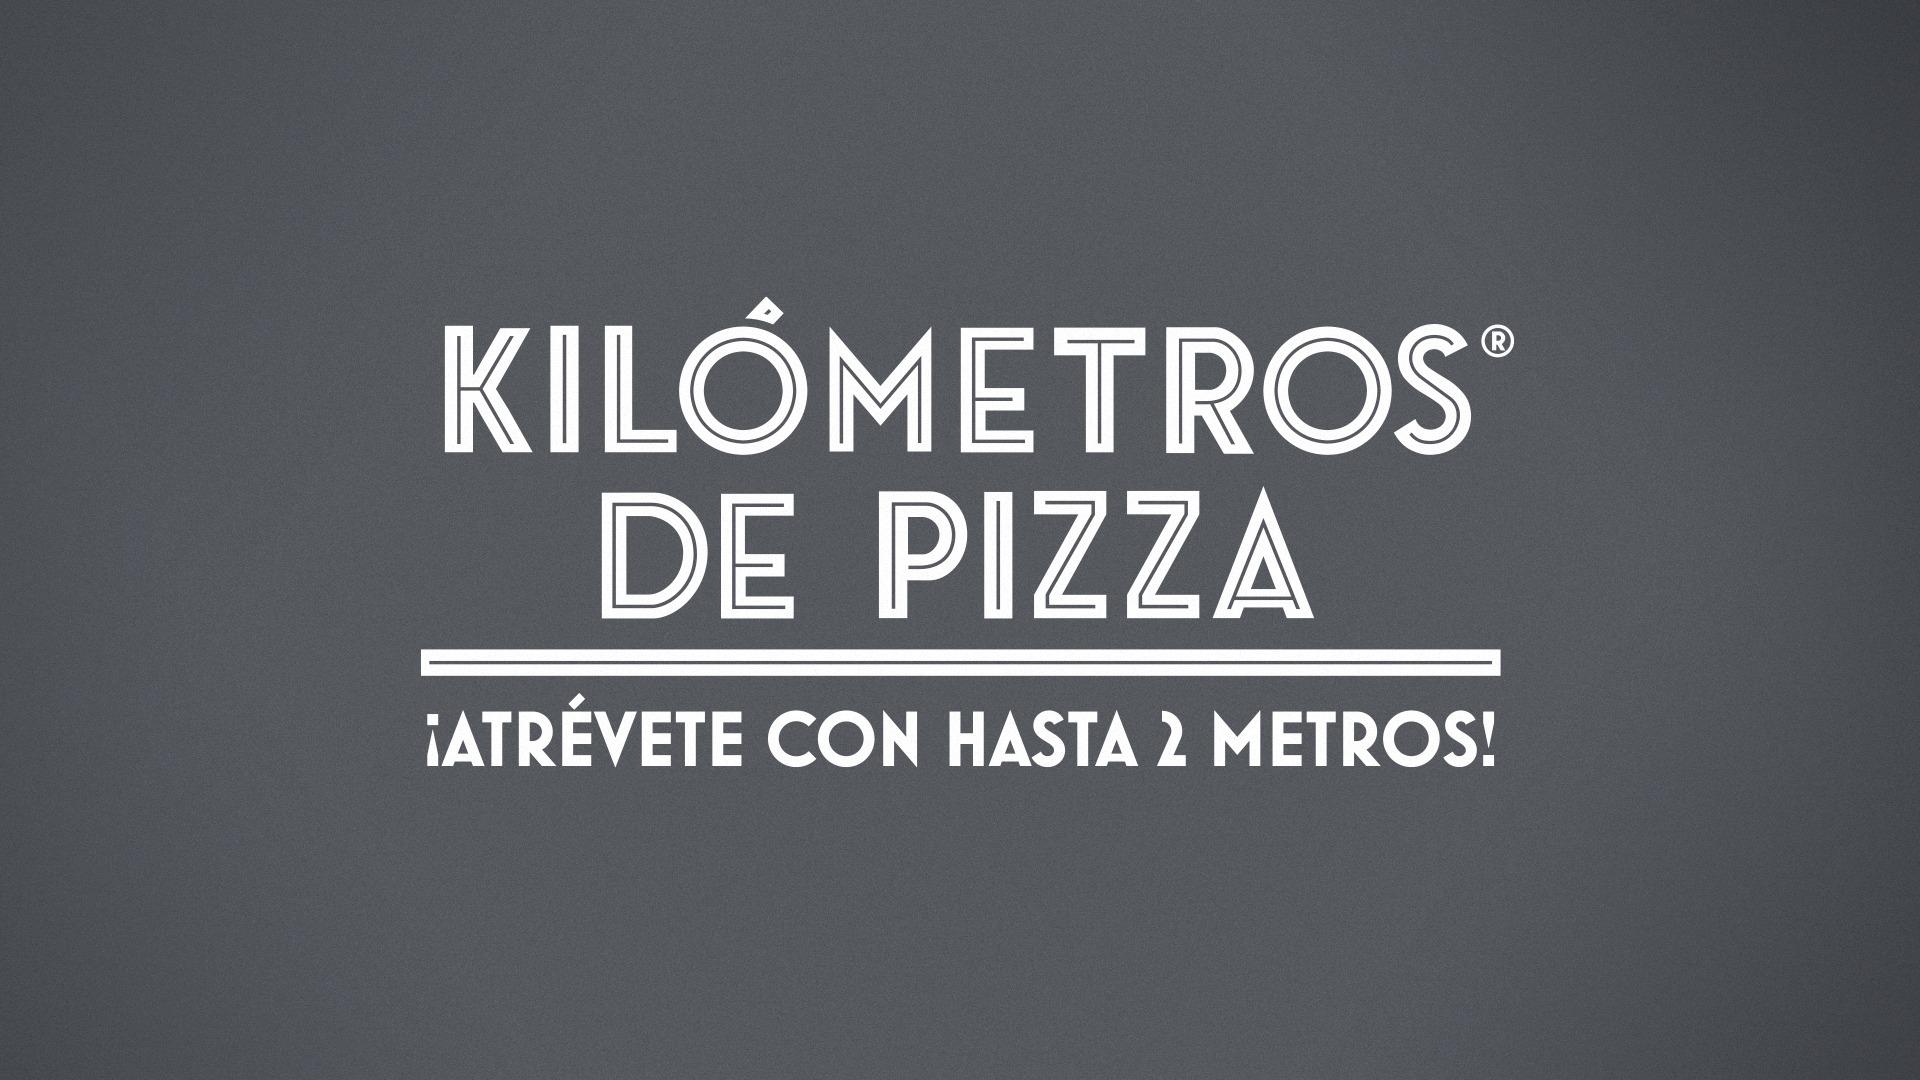 Franquicia Kilómetros de pizza